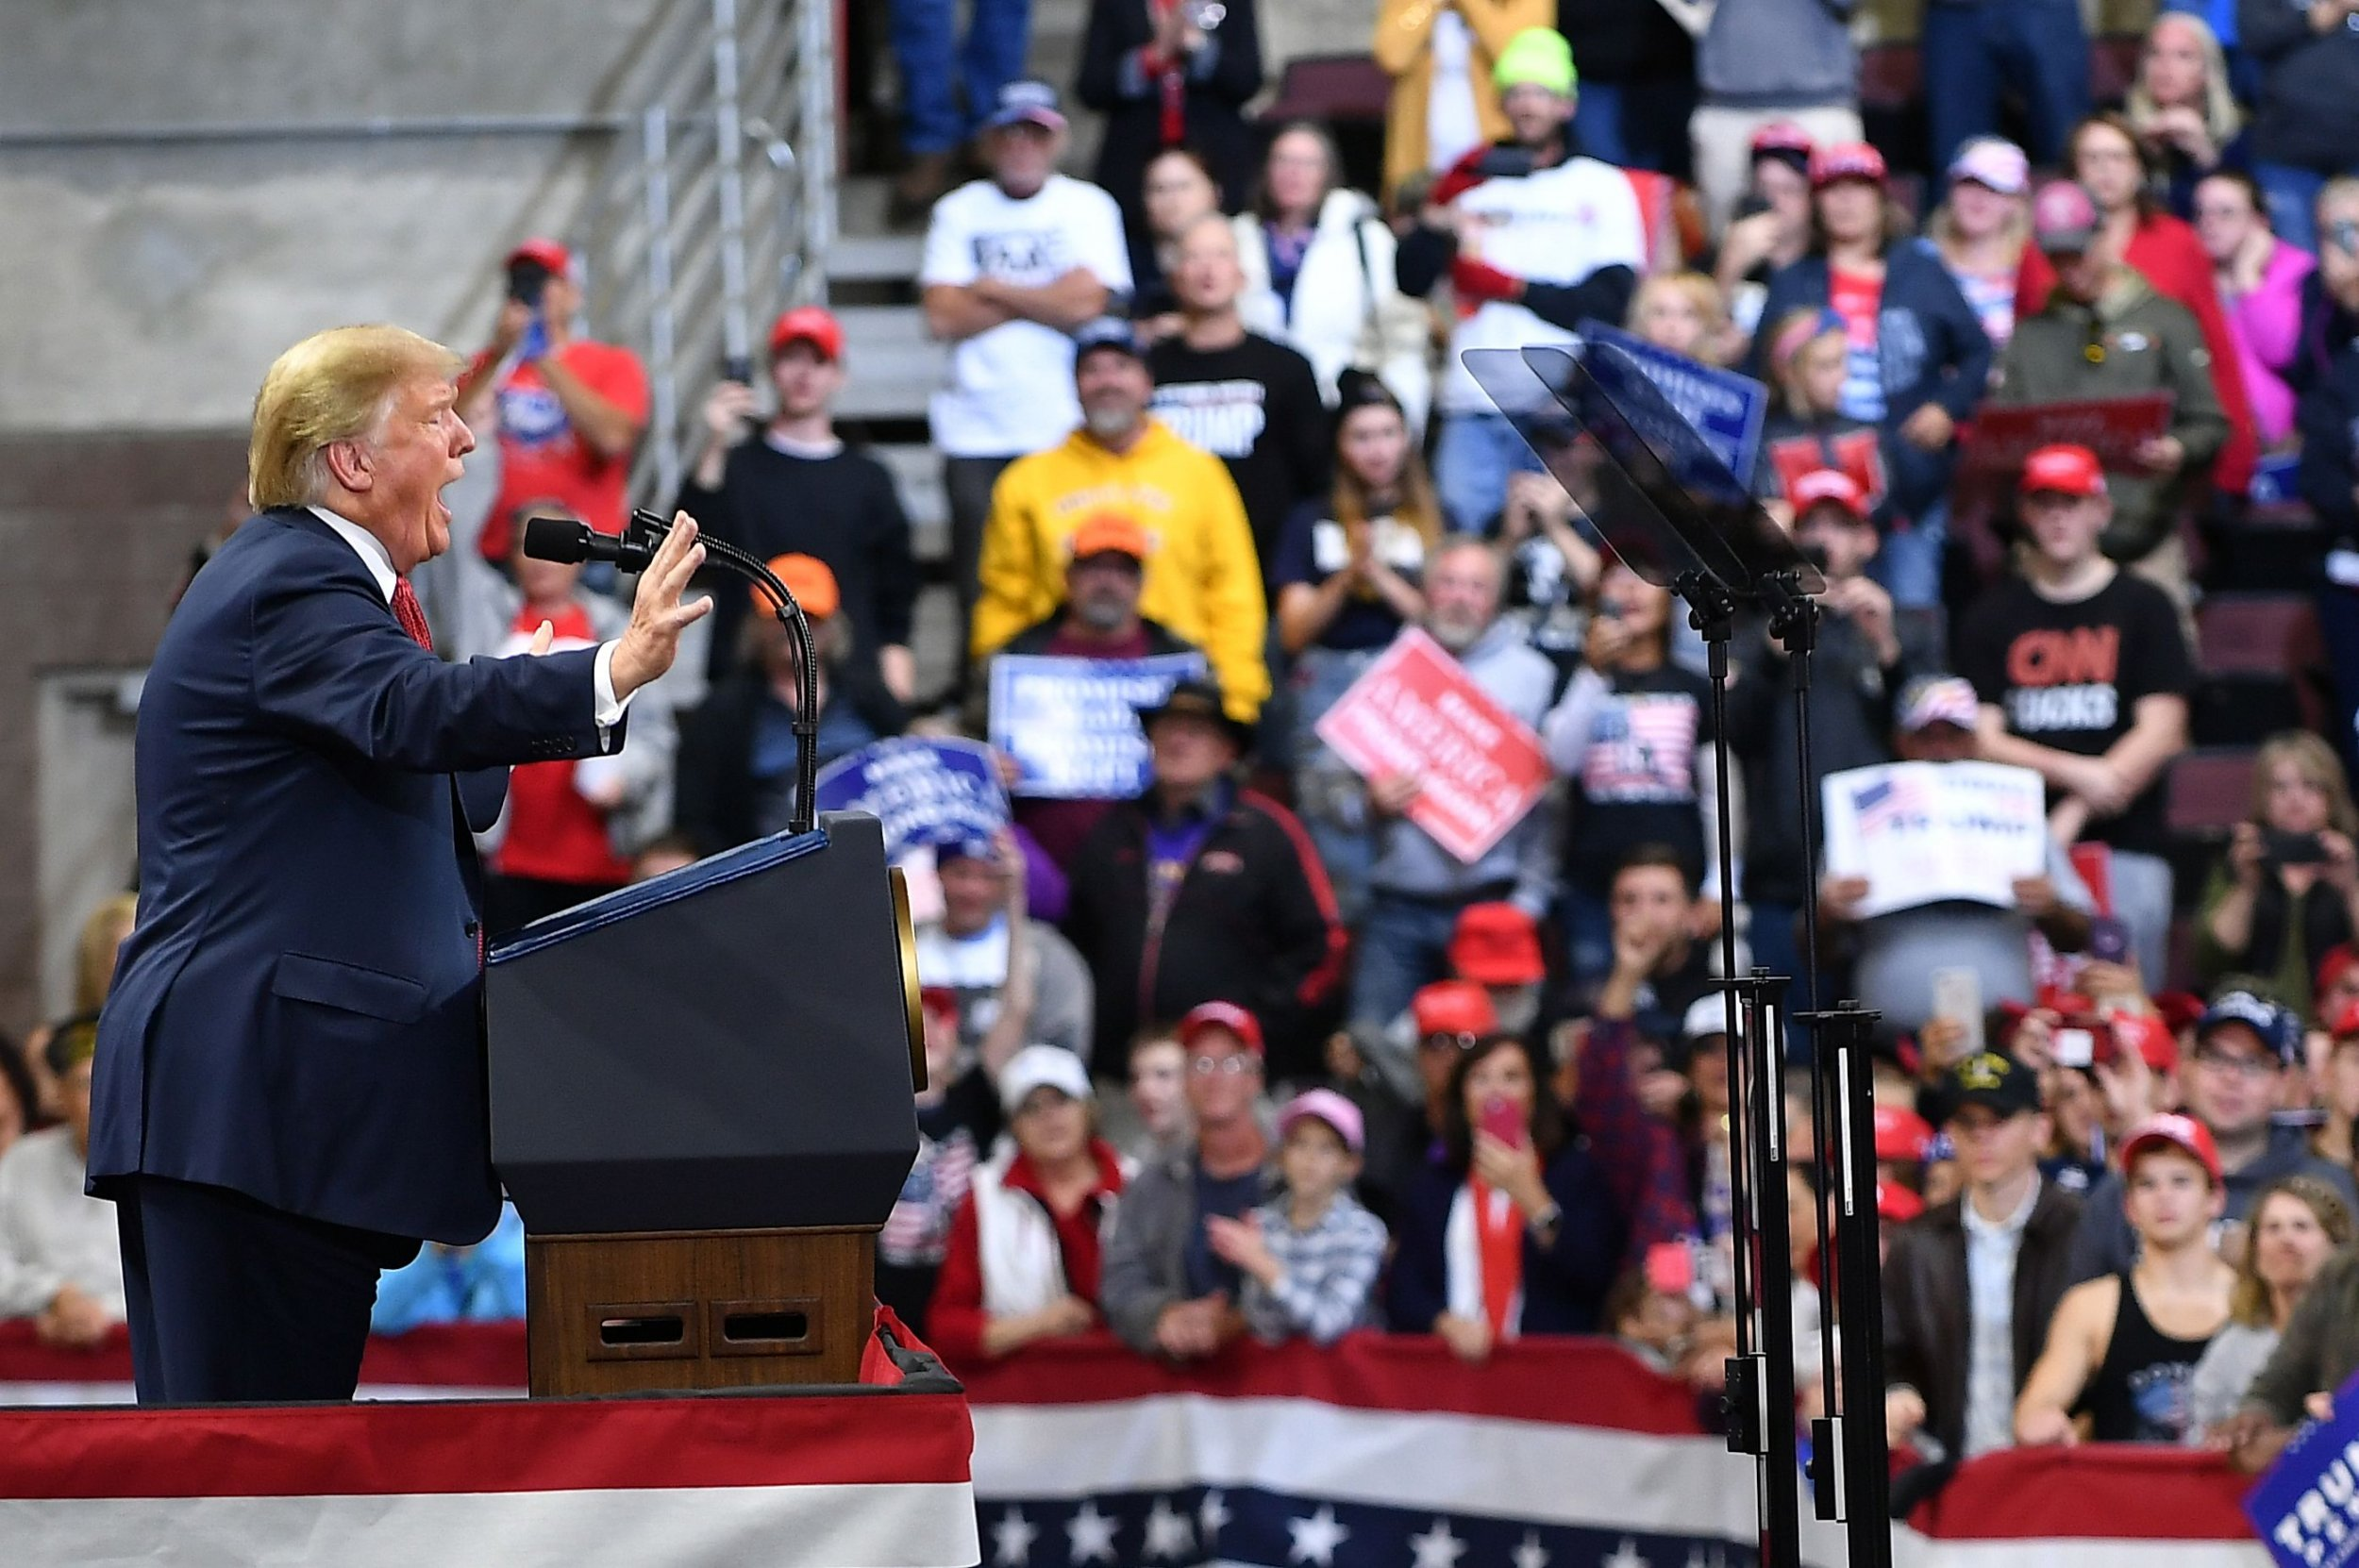 Donald Trump rallies, fox news, live